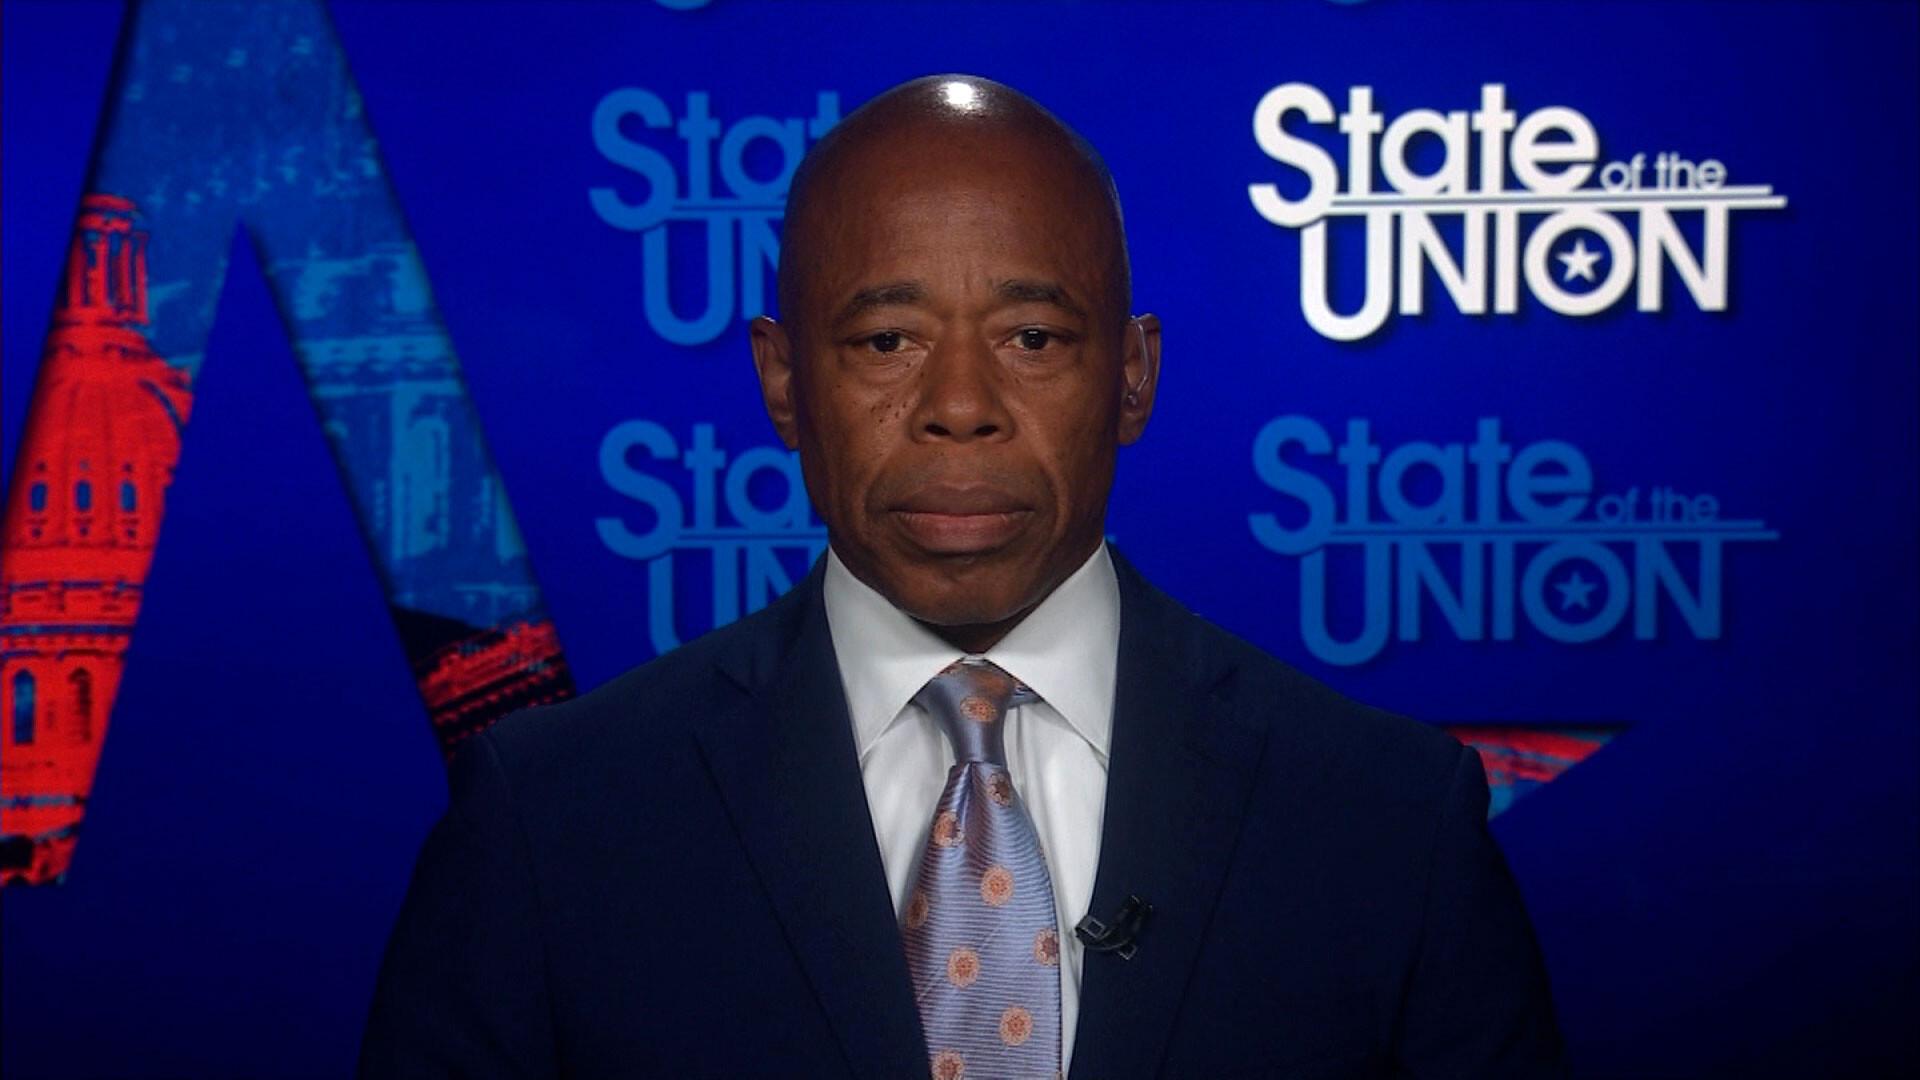 Adams says Democratic lawmakers 'misplaced' priorities on efforts to curb gun violence